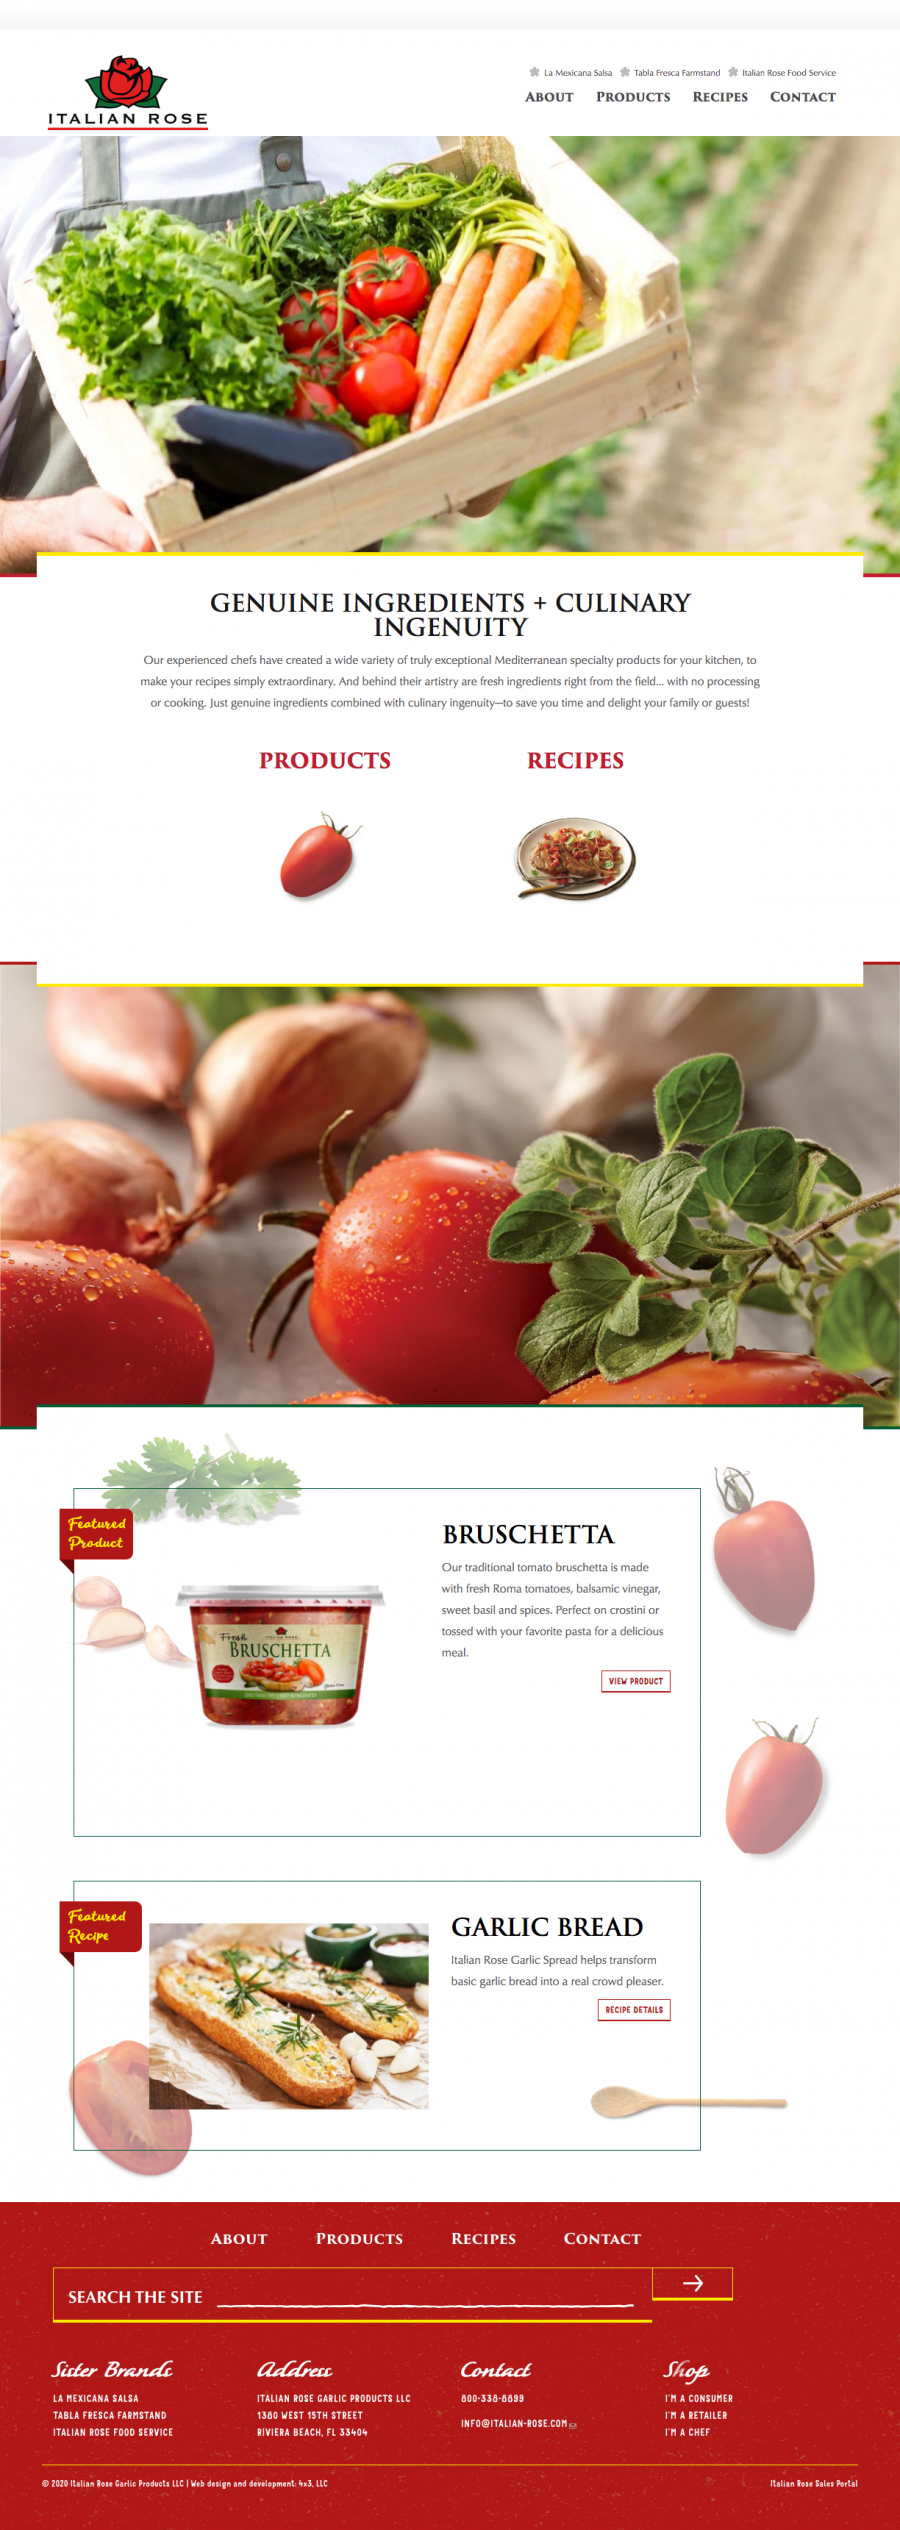 Italian Rose homepage